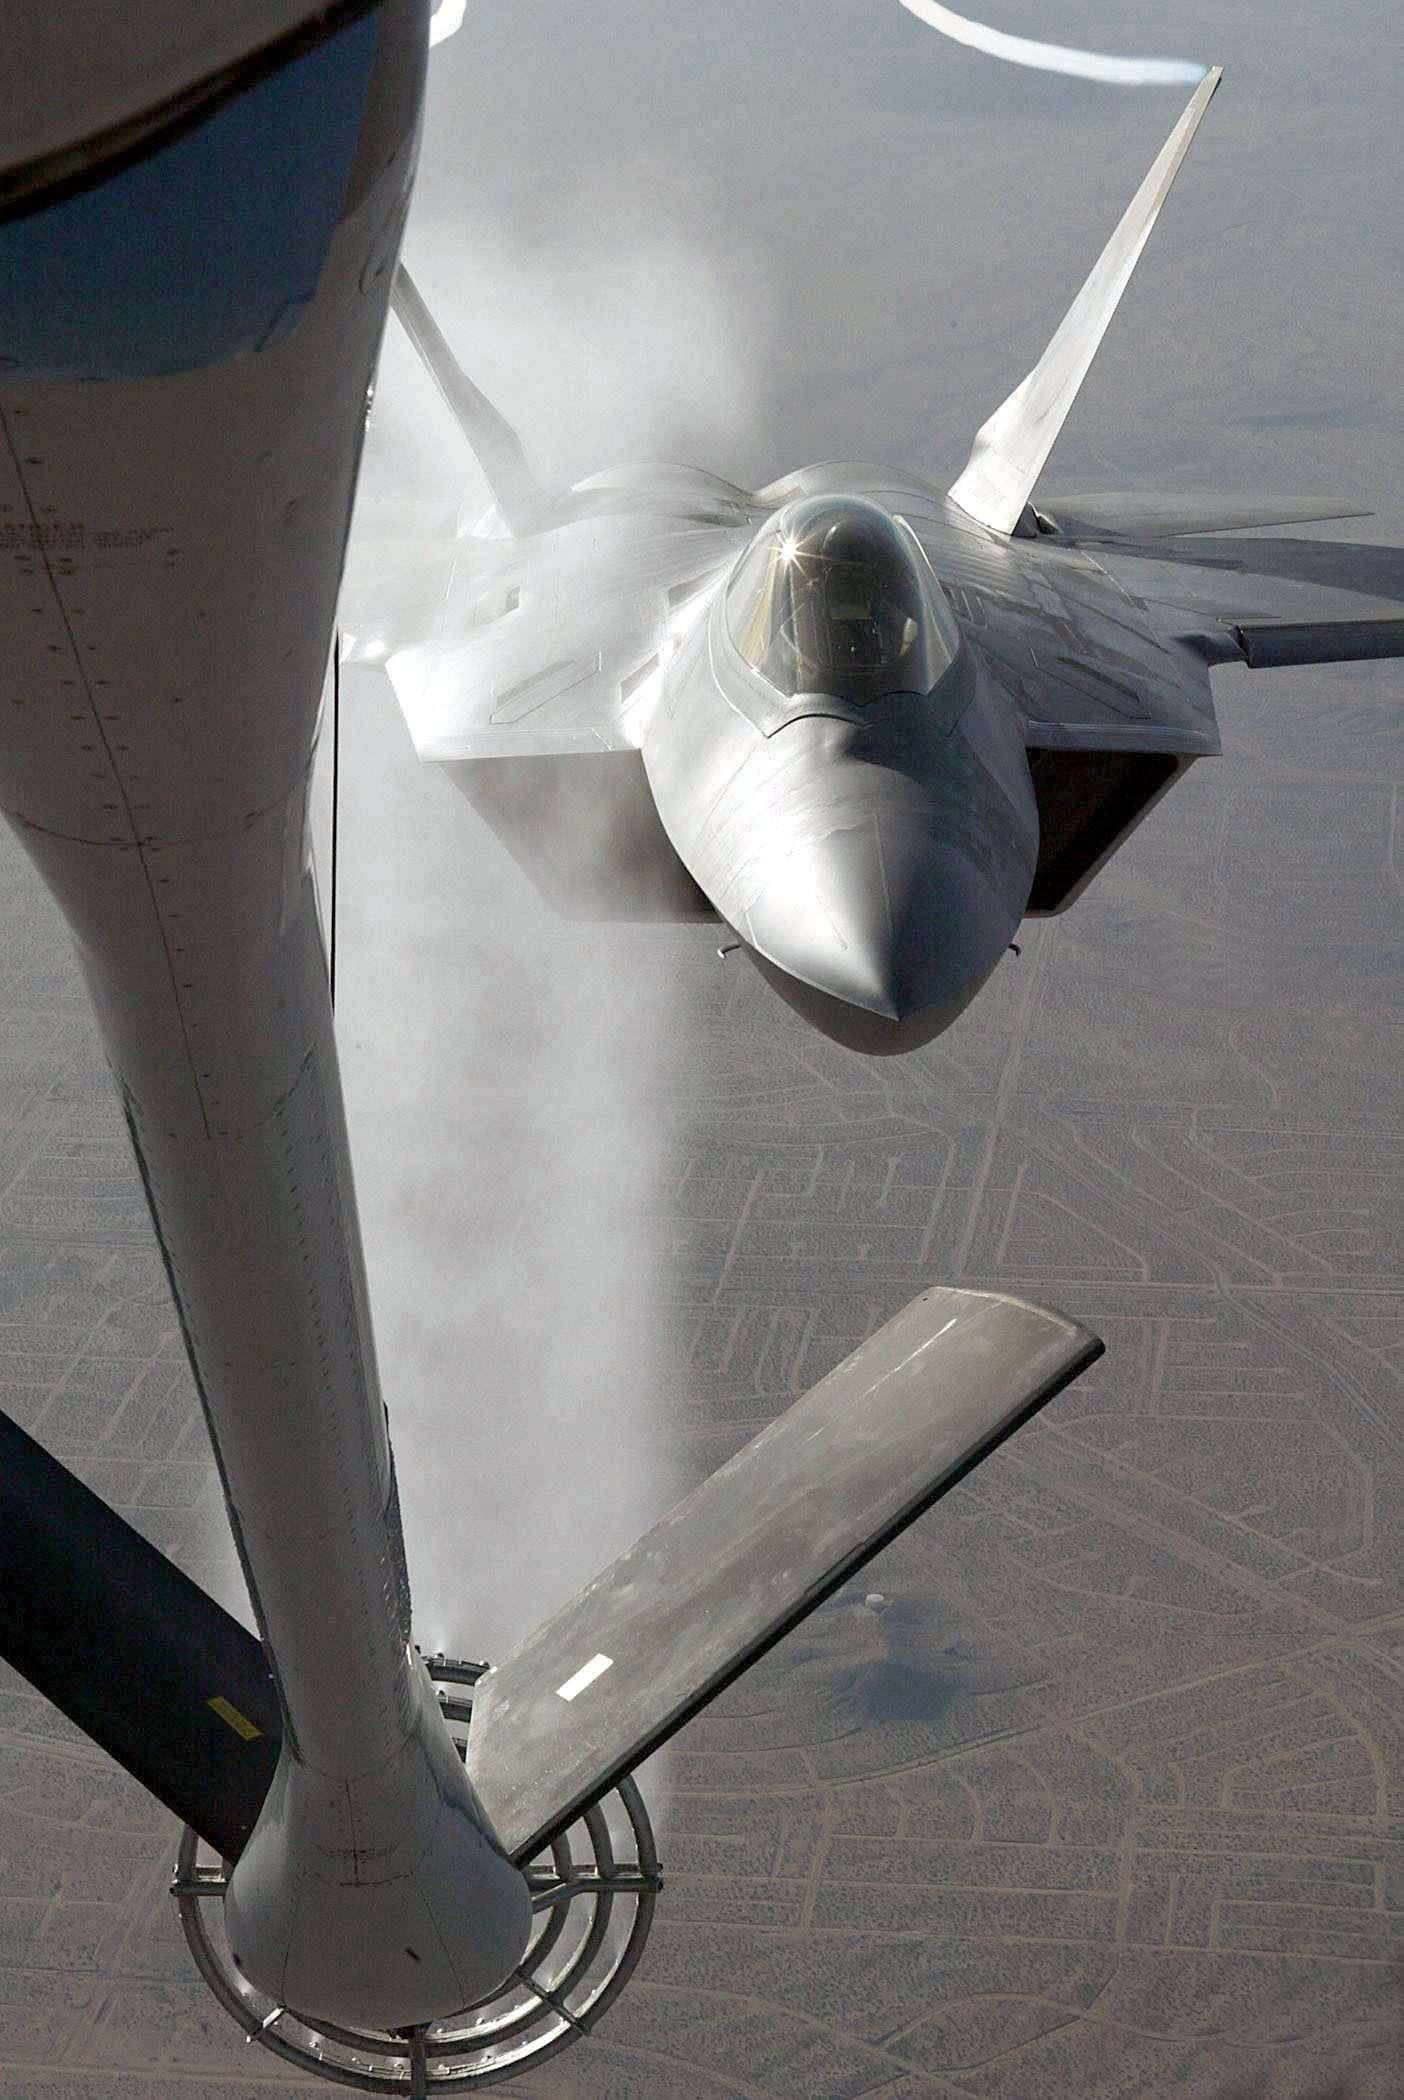 F-22 Raptor - Page 2 04021310